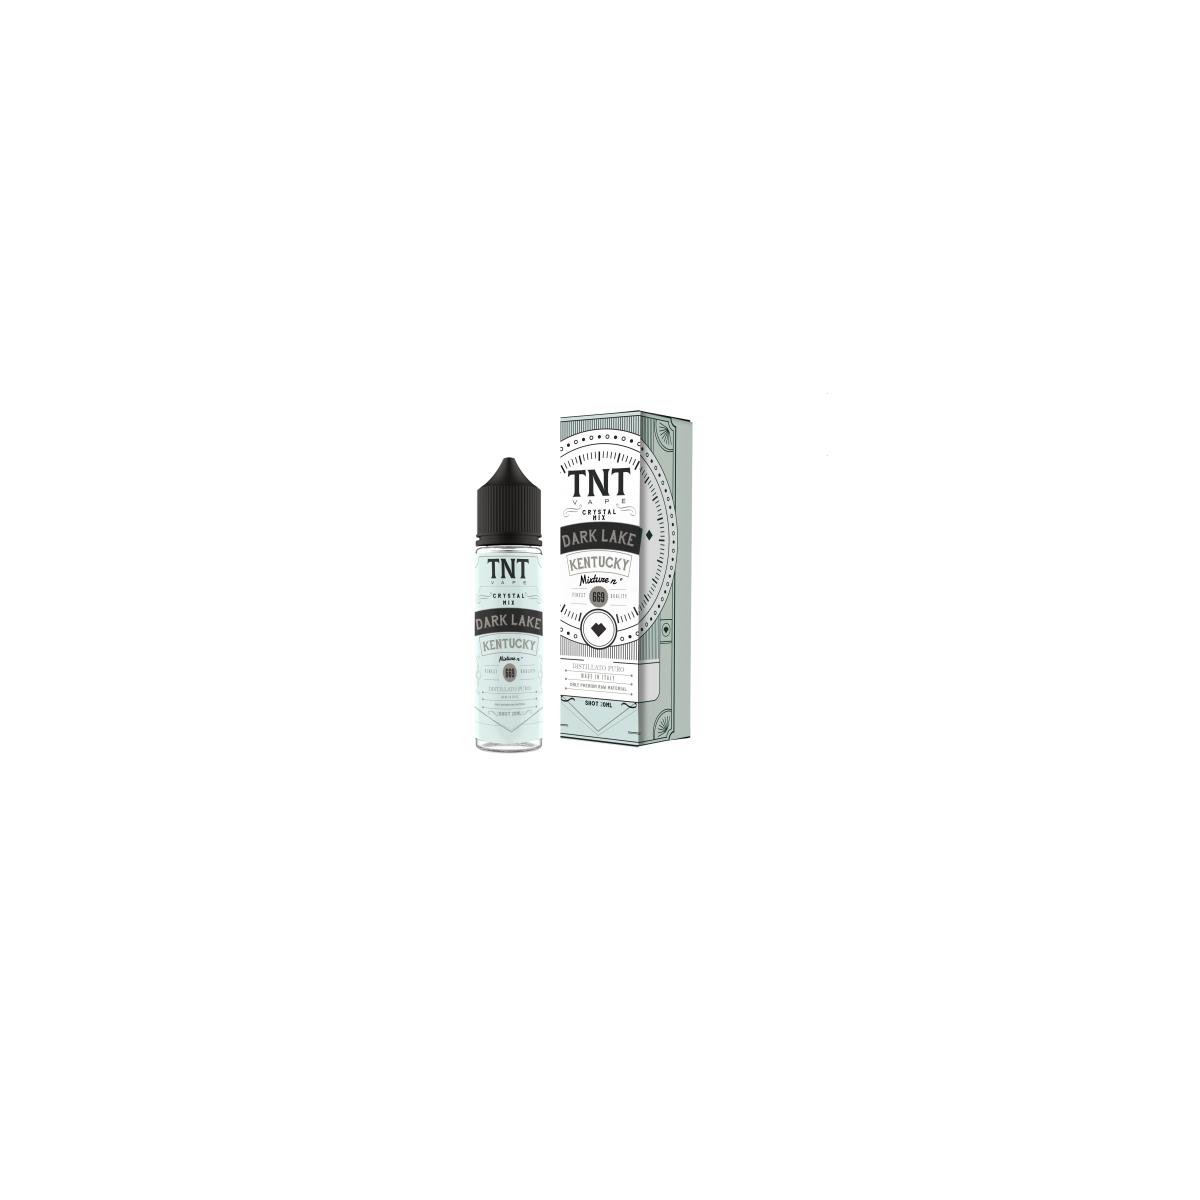 TNT vape Mixture Dark Lake 669 Aroma Scomposto 20ml in flacone da 60ml